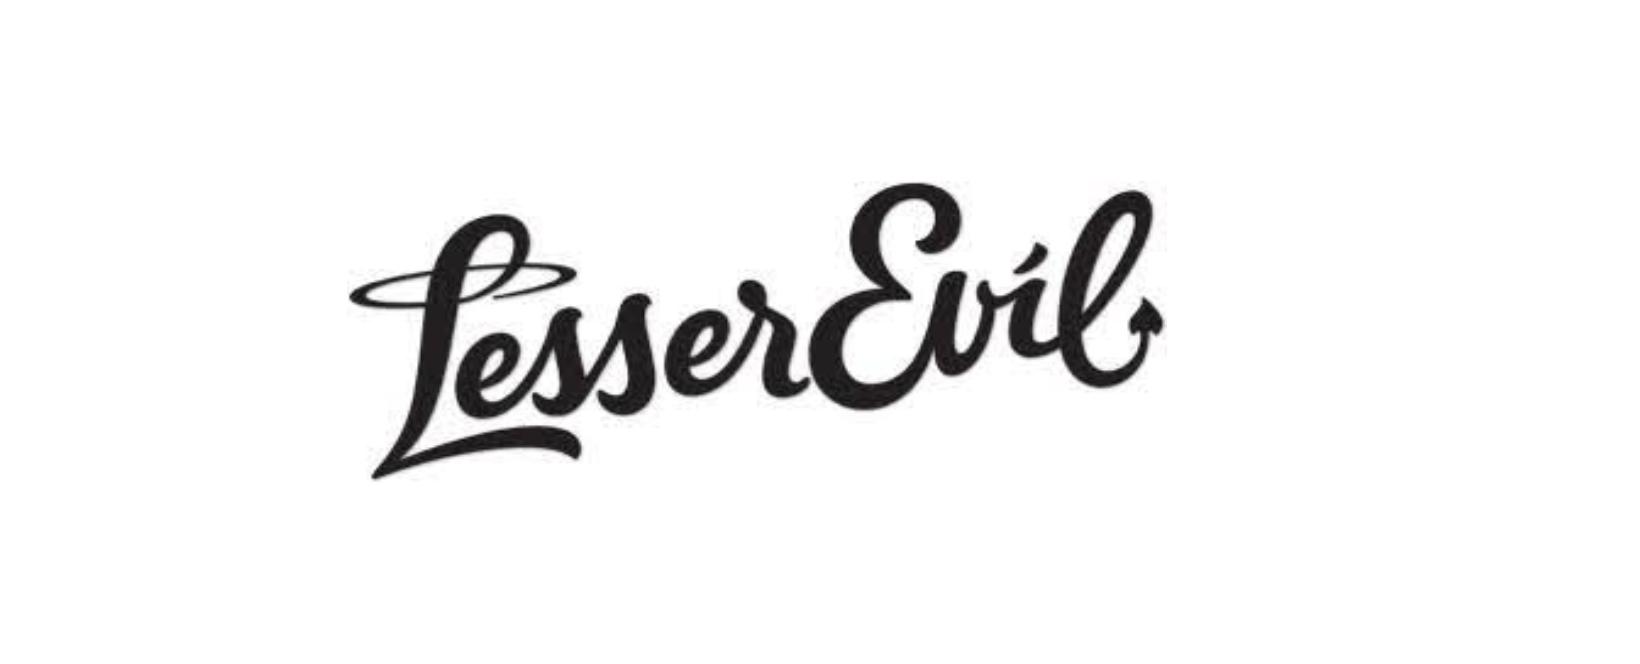 LesserEvil Discount Code 2021